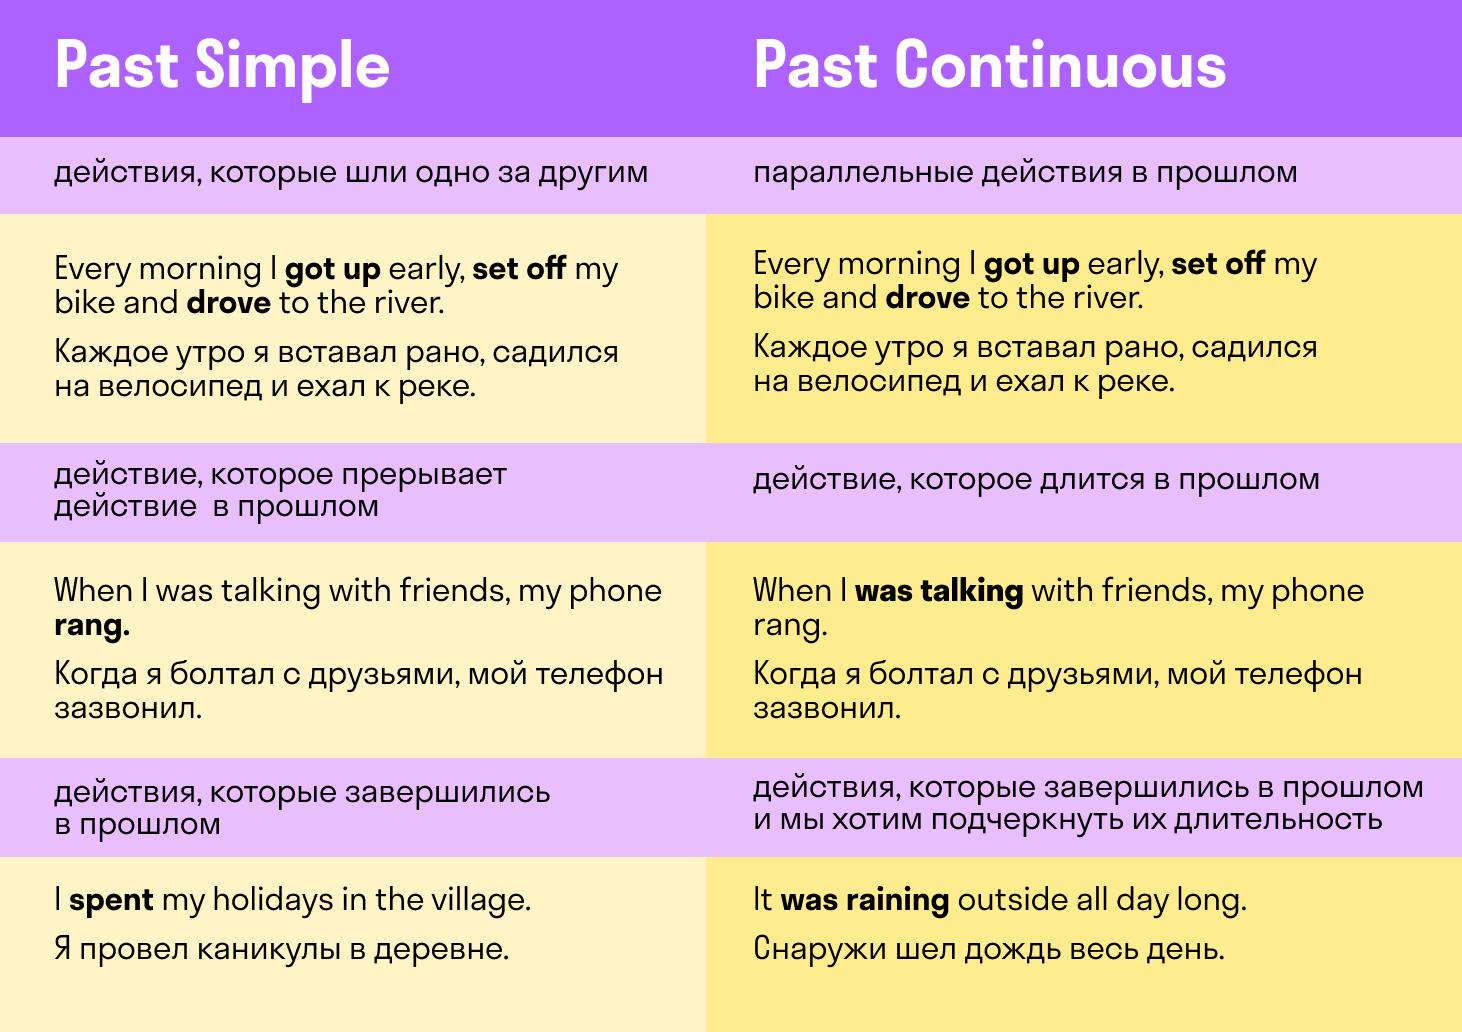 различия Past Simple и Past Continuous